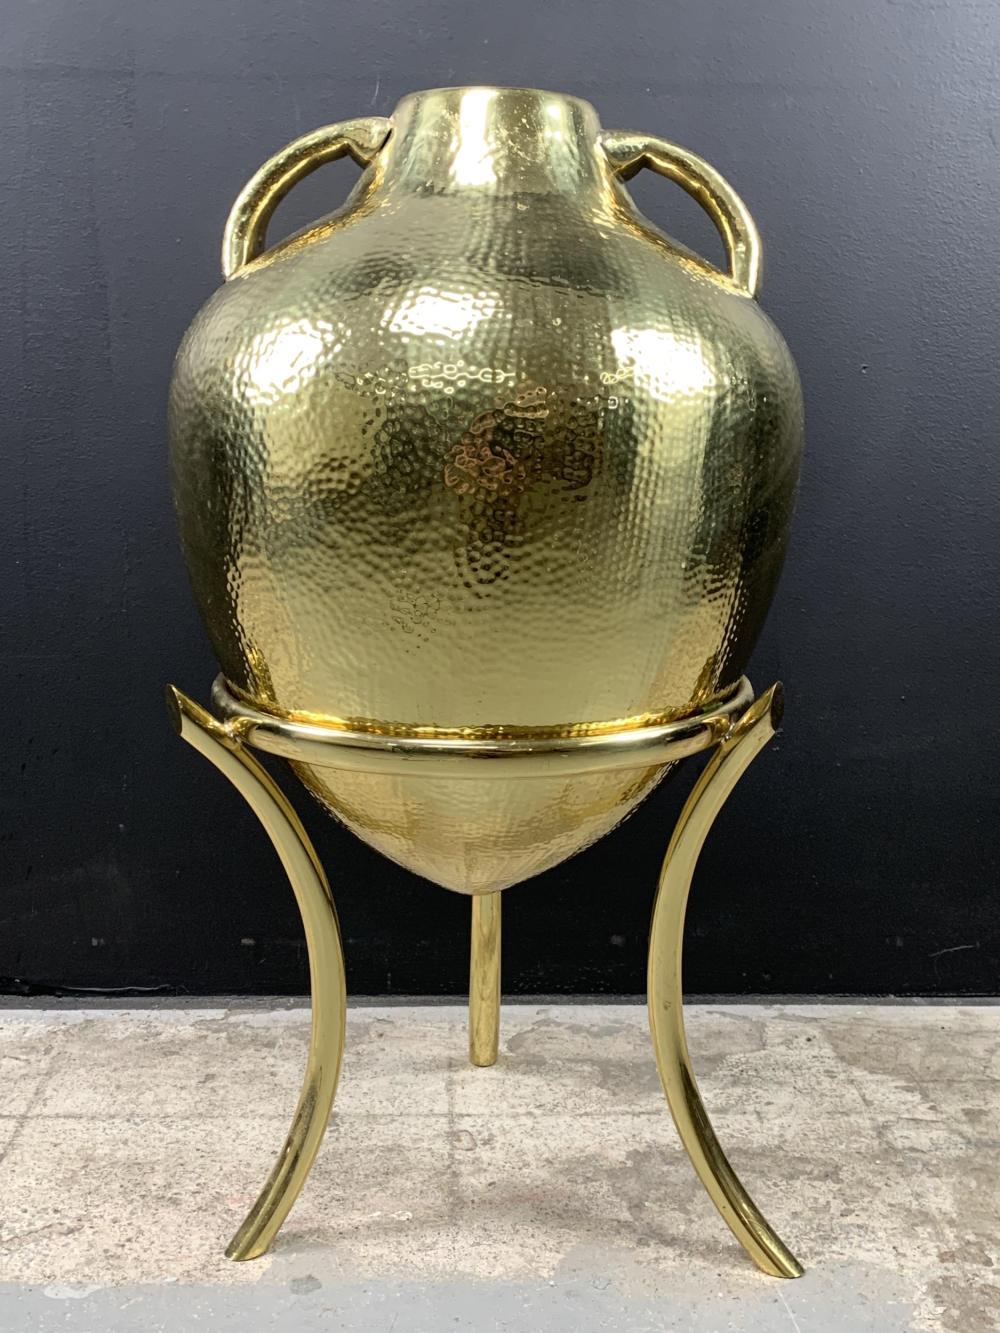 Hollywood Regency Style Hammered Gilt Urn On Stand